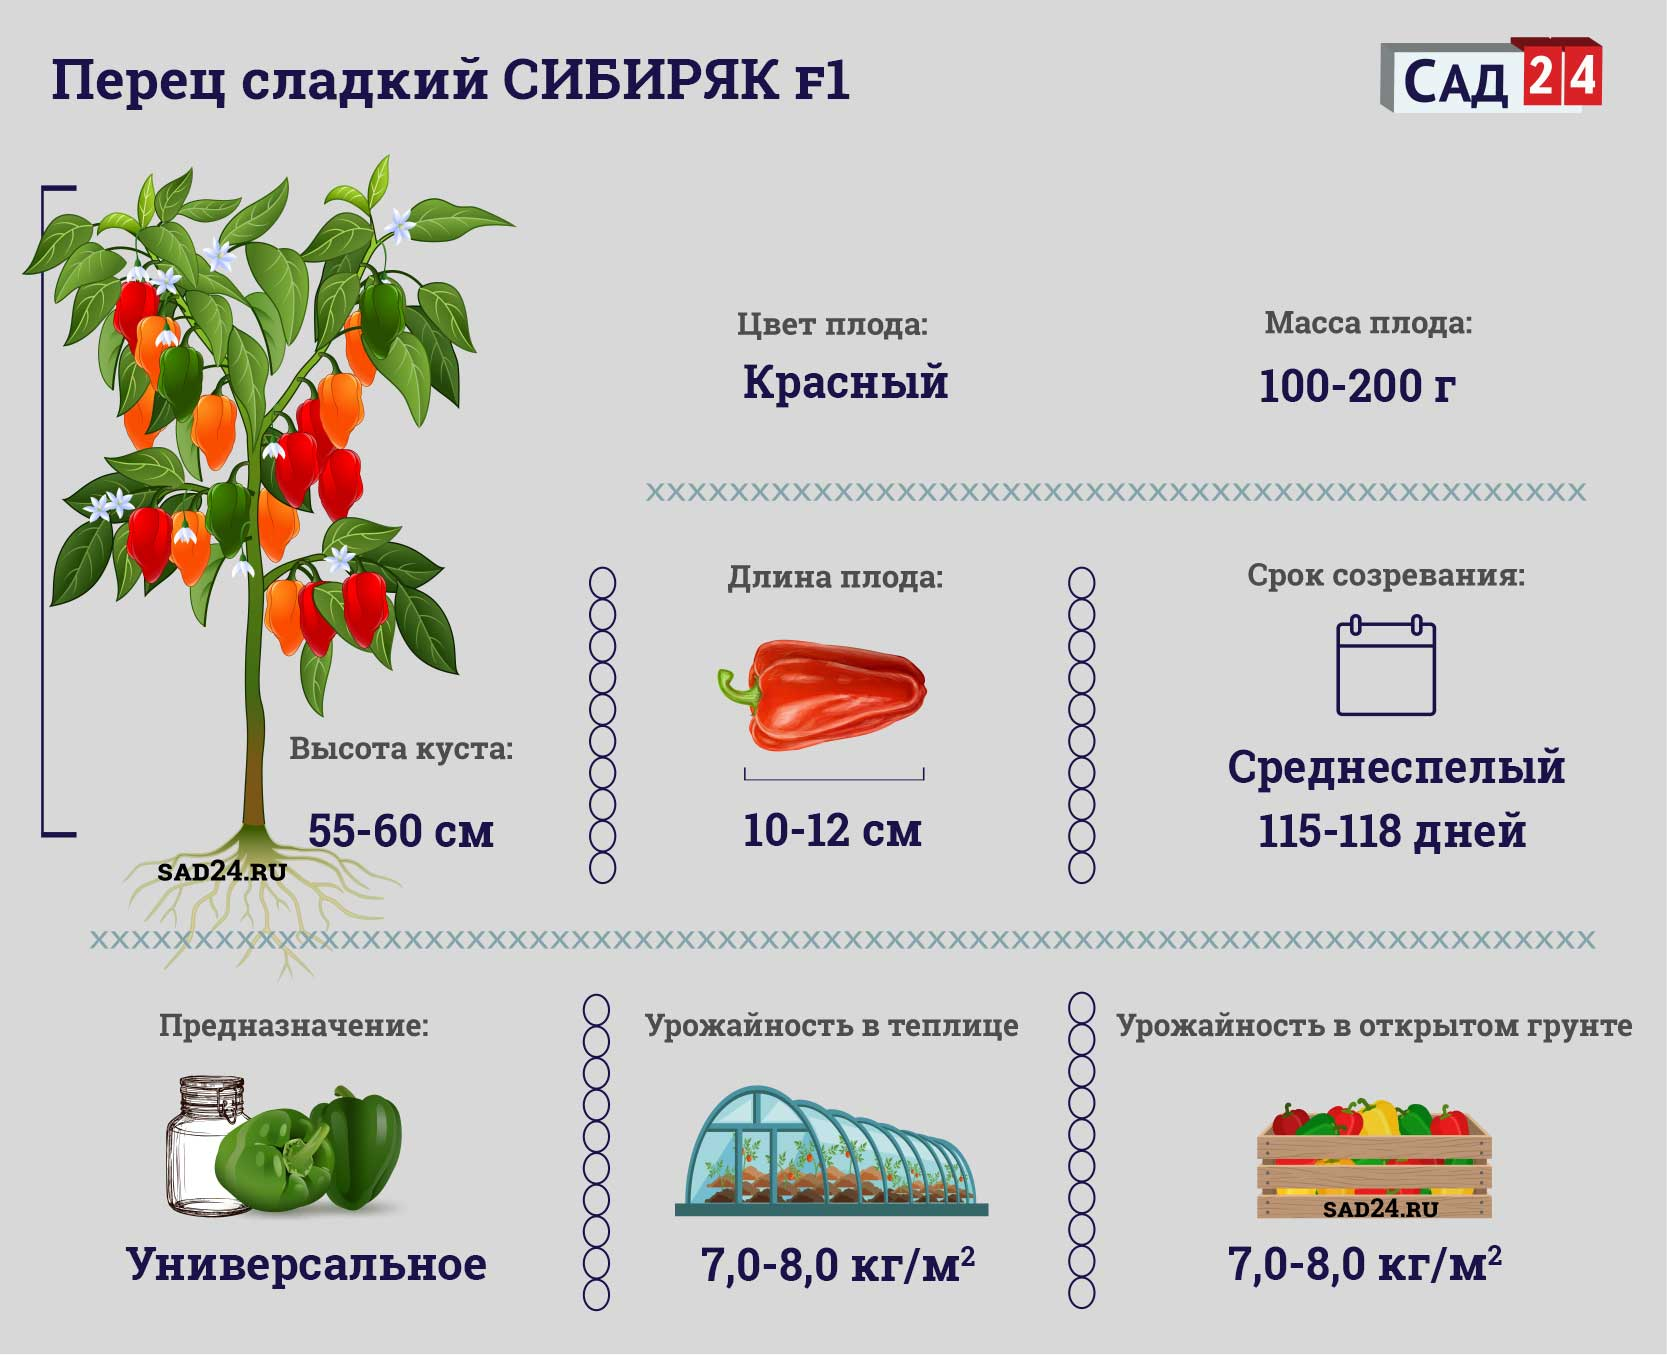 Сибиряк F1 https://sad24.ru